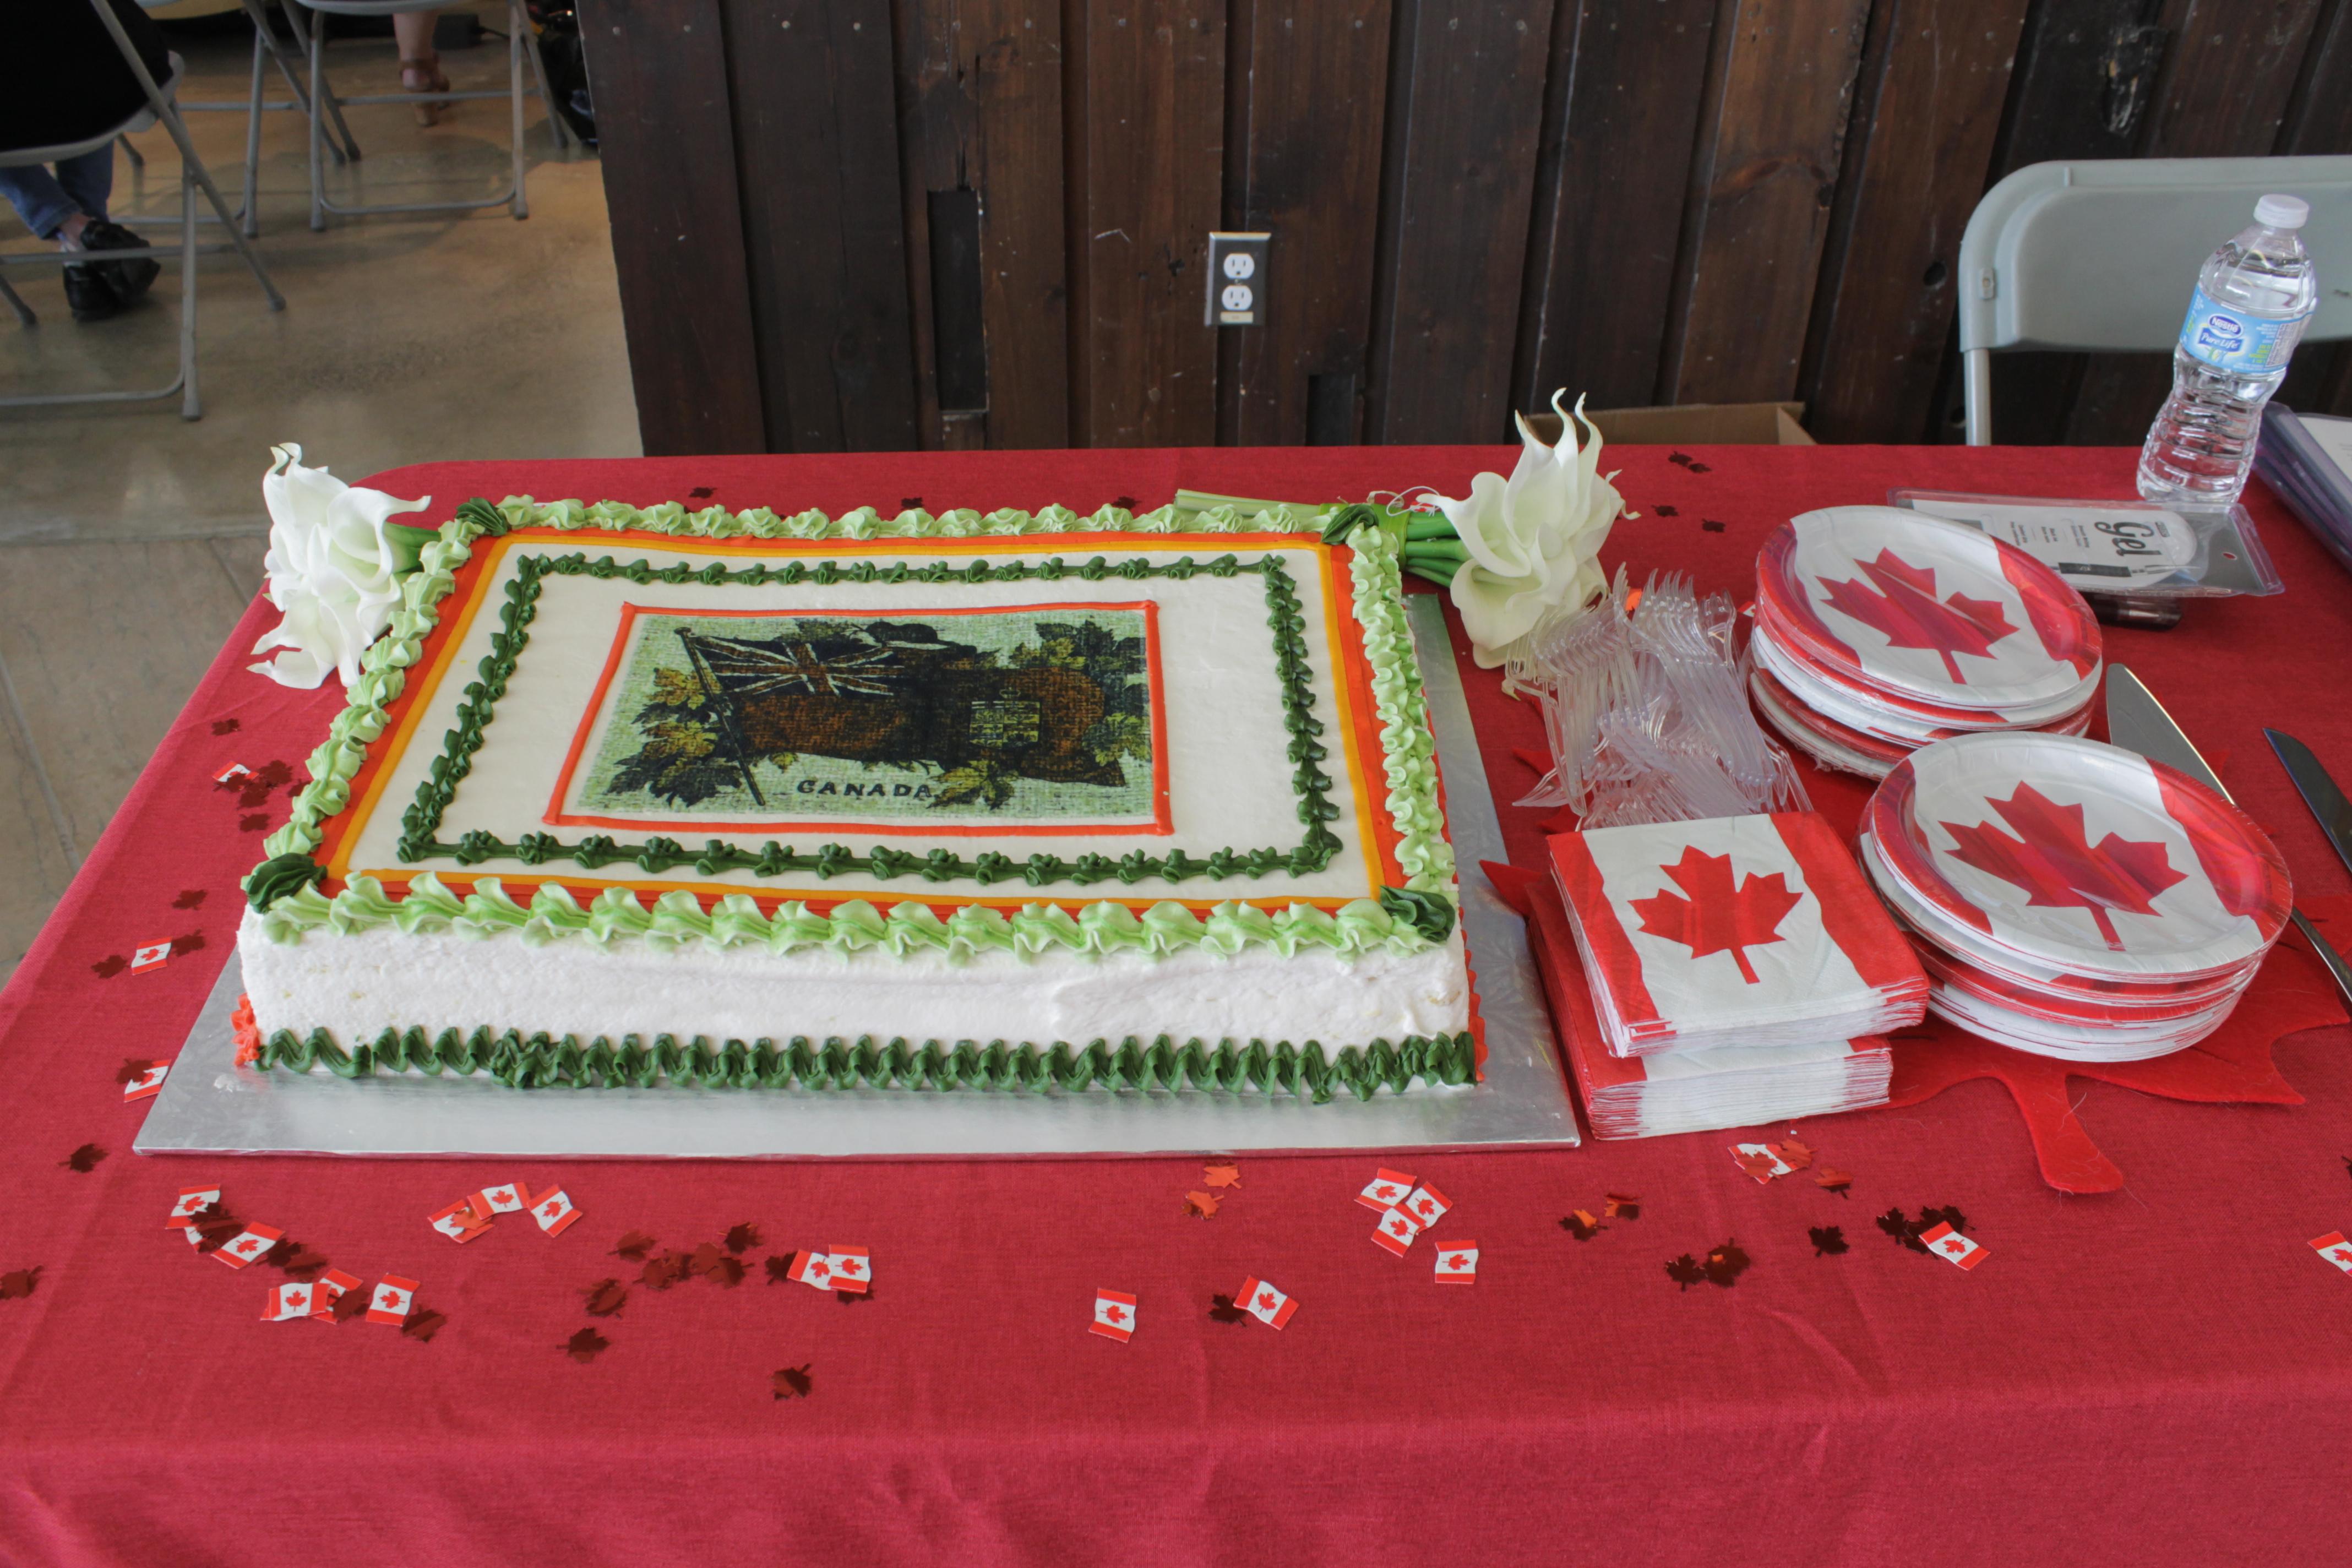 Canada 150 Cake 2017